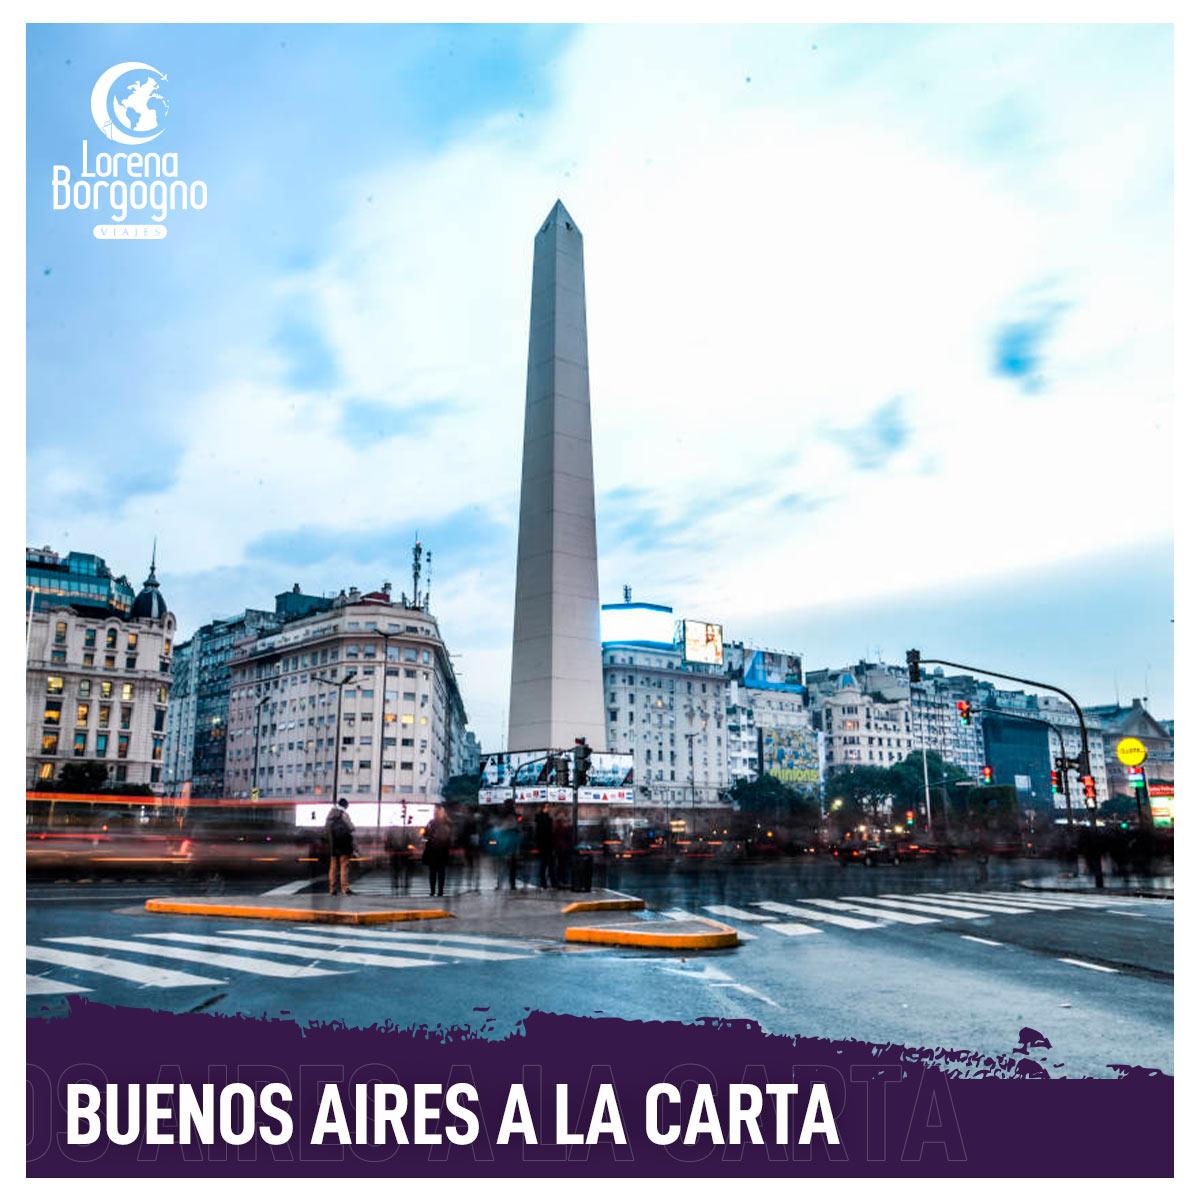 BUENOS AIRES A LA CARTA (IT)